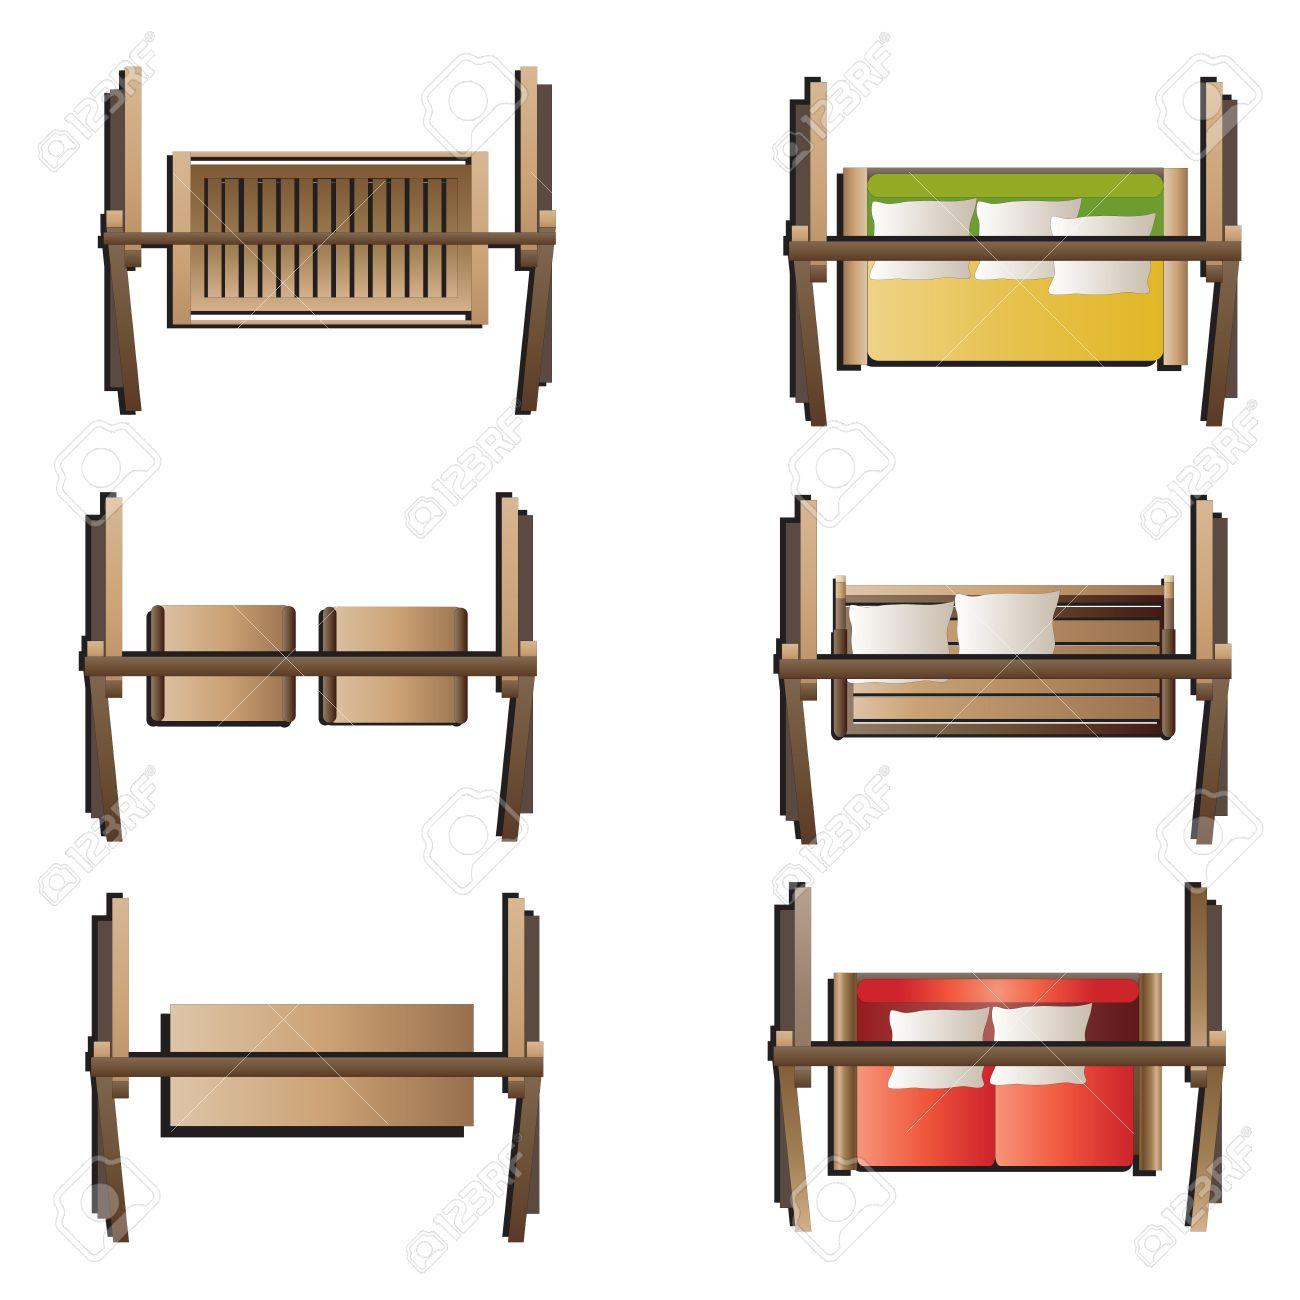 Famoso Muebles De Exterior De Alta Cima Modelo - Muebles Para Ideas ...